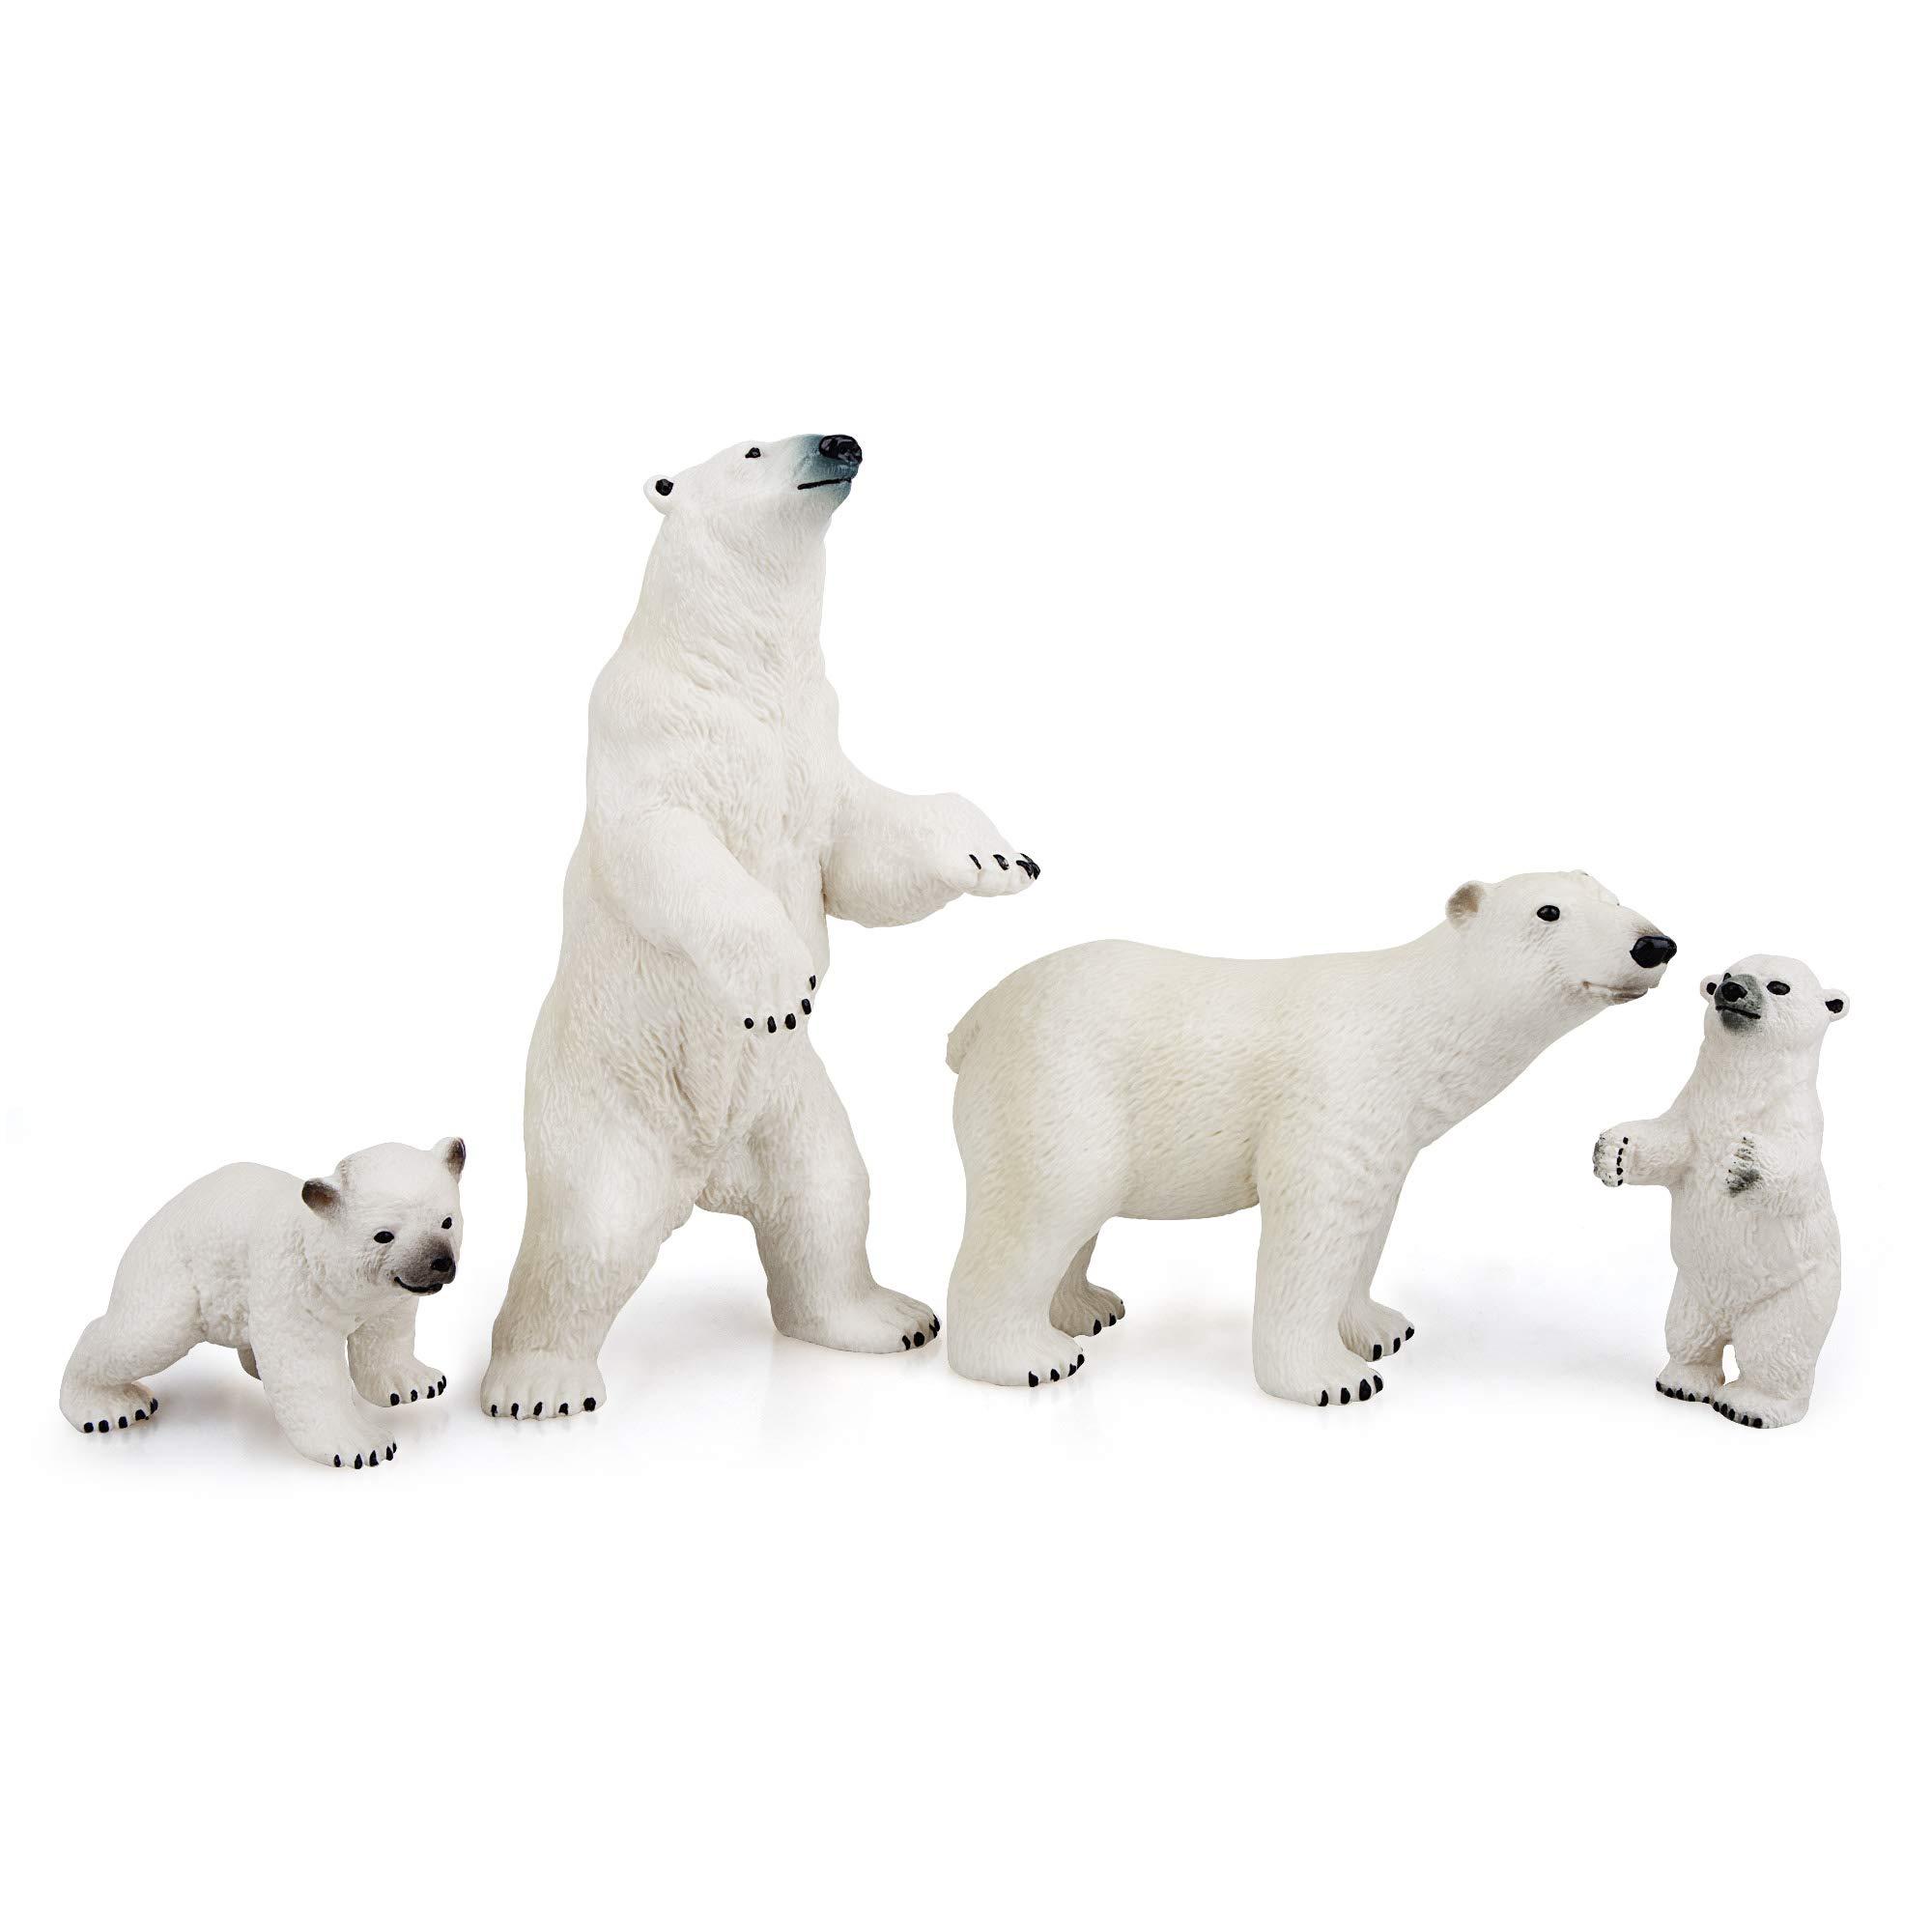 "TOYMANY 4PCS Polar Bear Figurines Toy Set, 2-5"" Realistic Plastic Polar Animals Figures Family Set with Baby Polar Bears…"